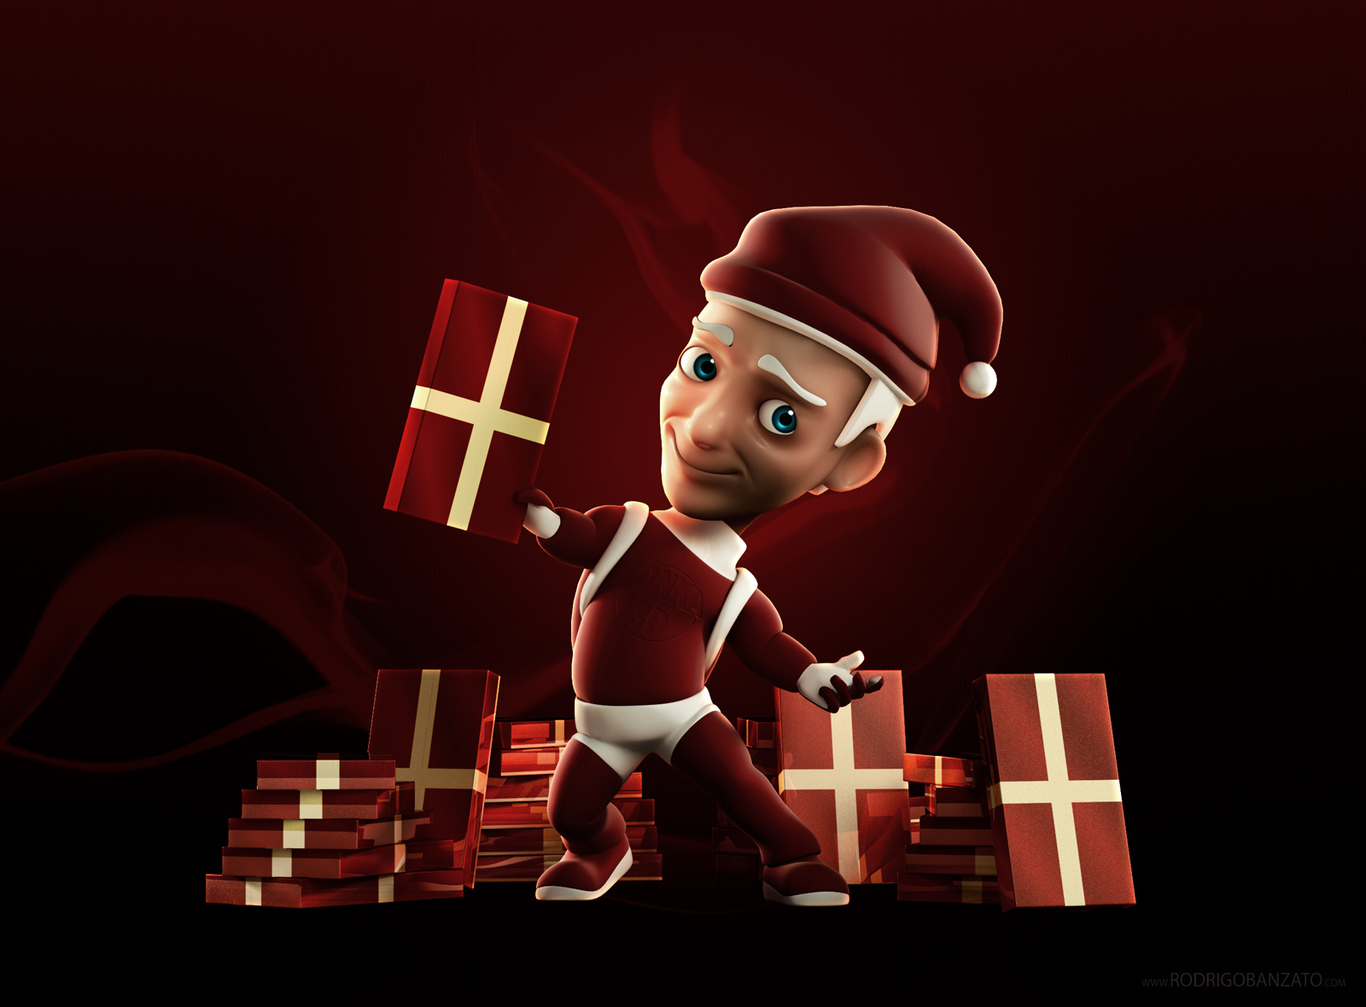 Banzato happy christmas 1 956540d8 kboh